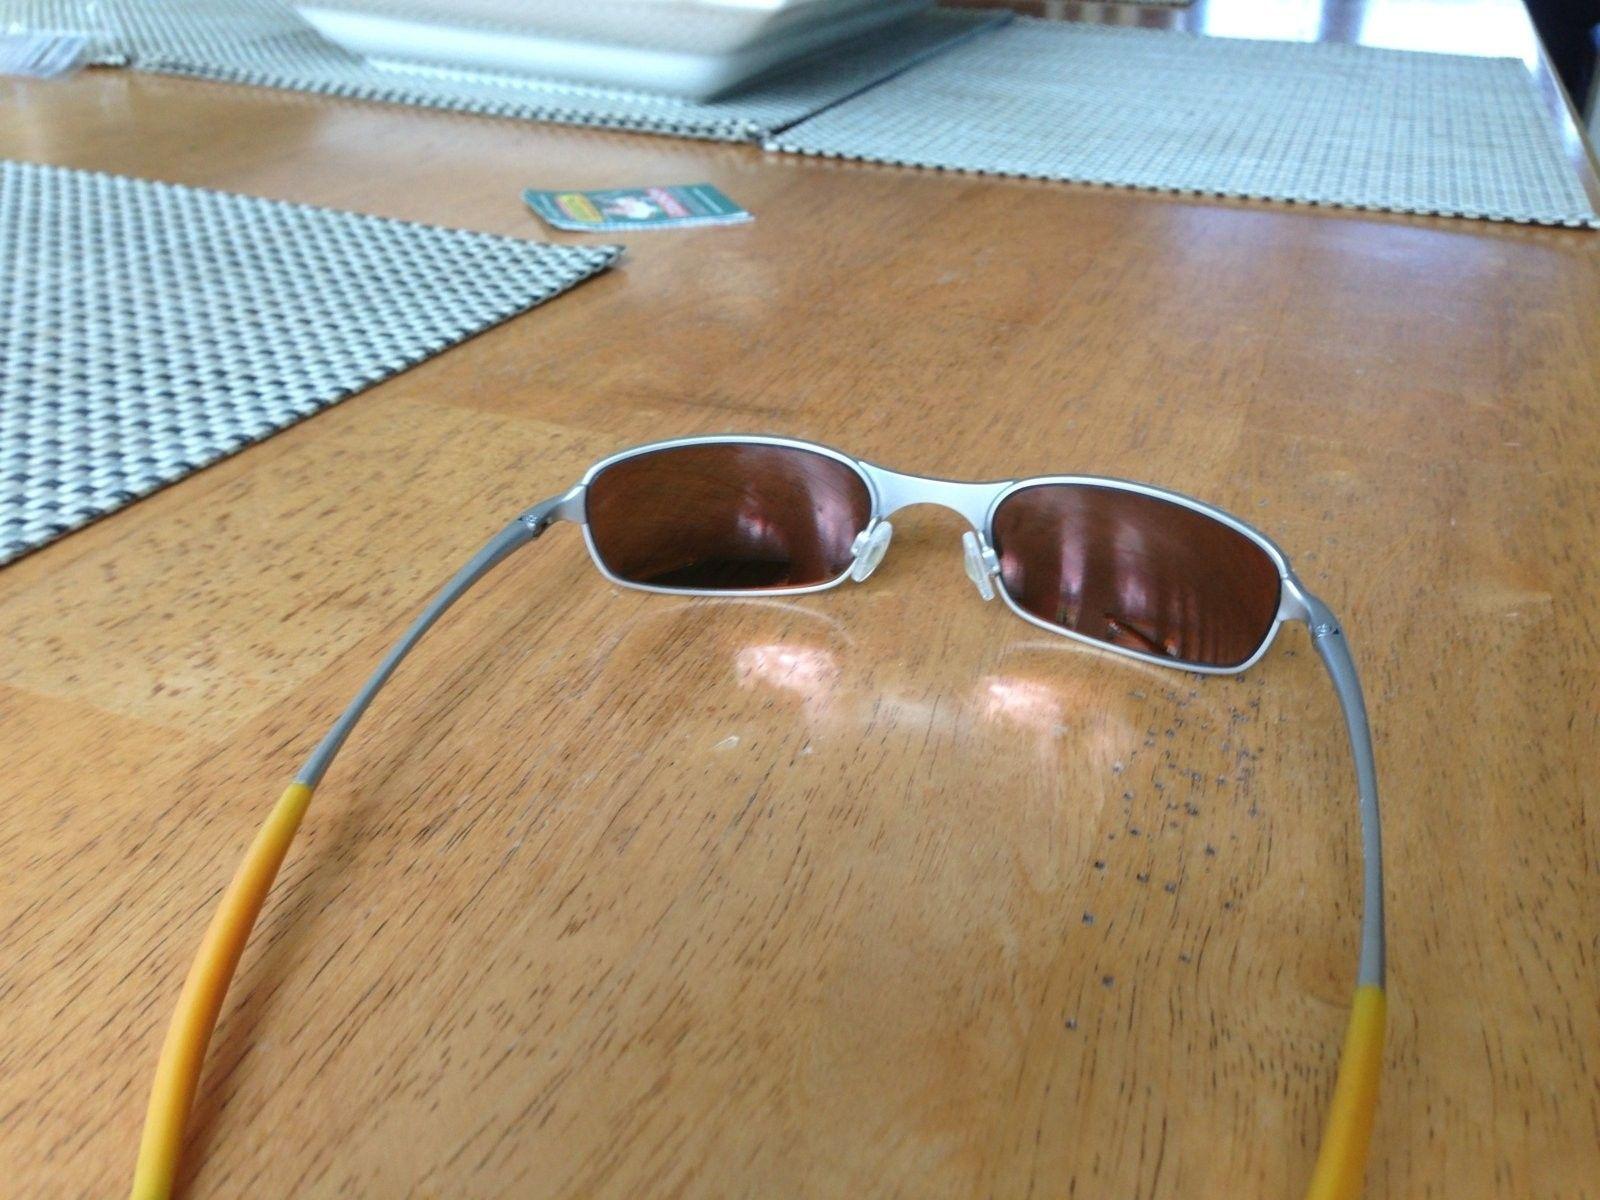 Square 2.0 Spring Hinges - Silver frames with Plasma Lenses - IMG_0725.jpg